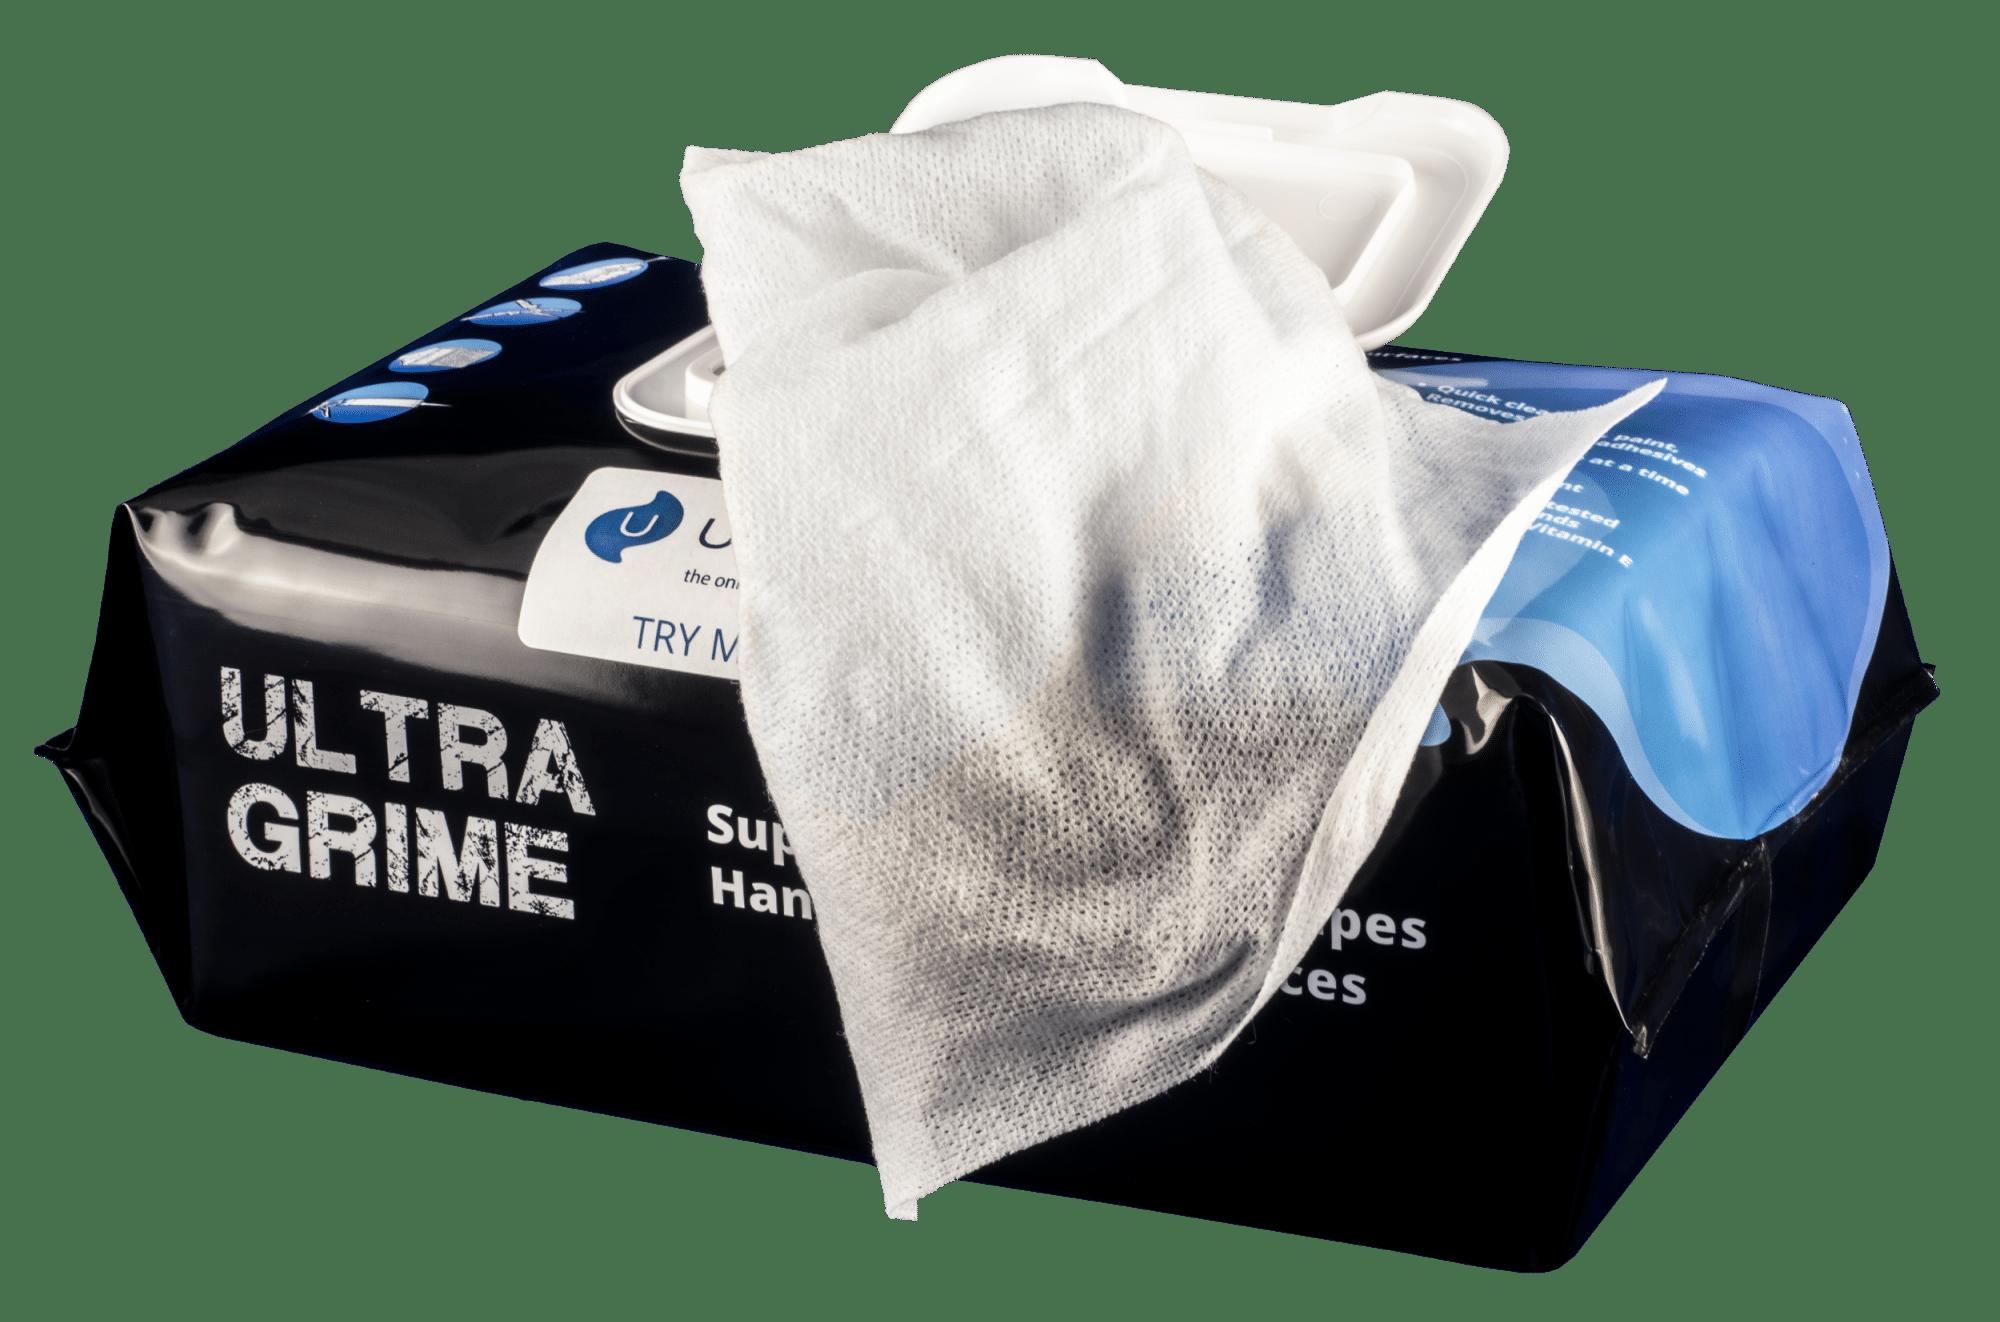 Ultragrime wipes